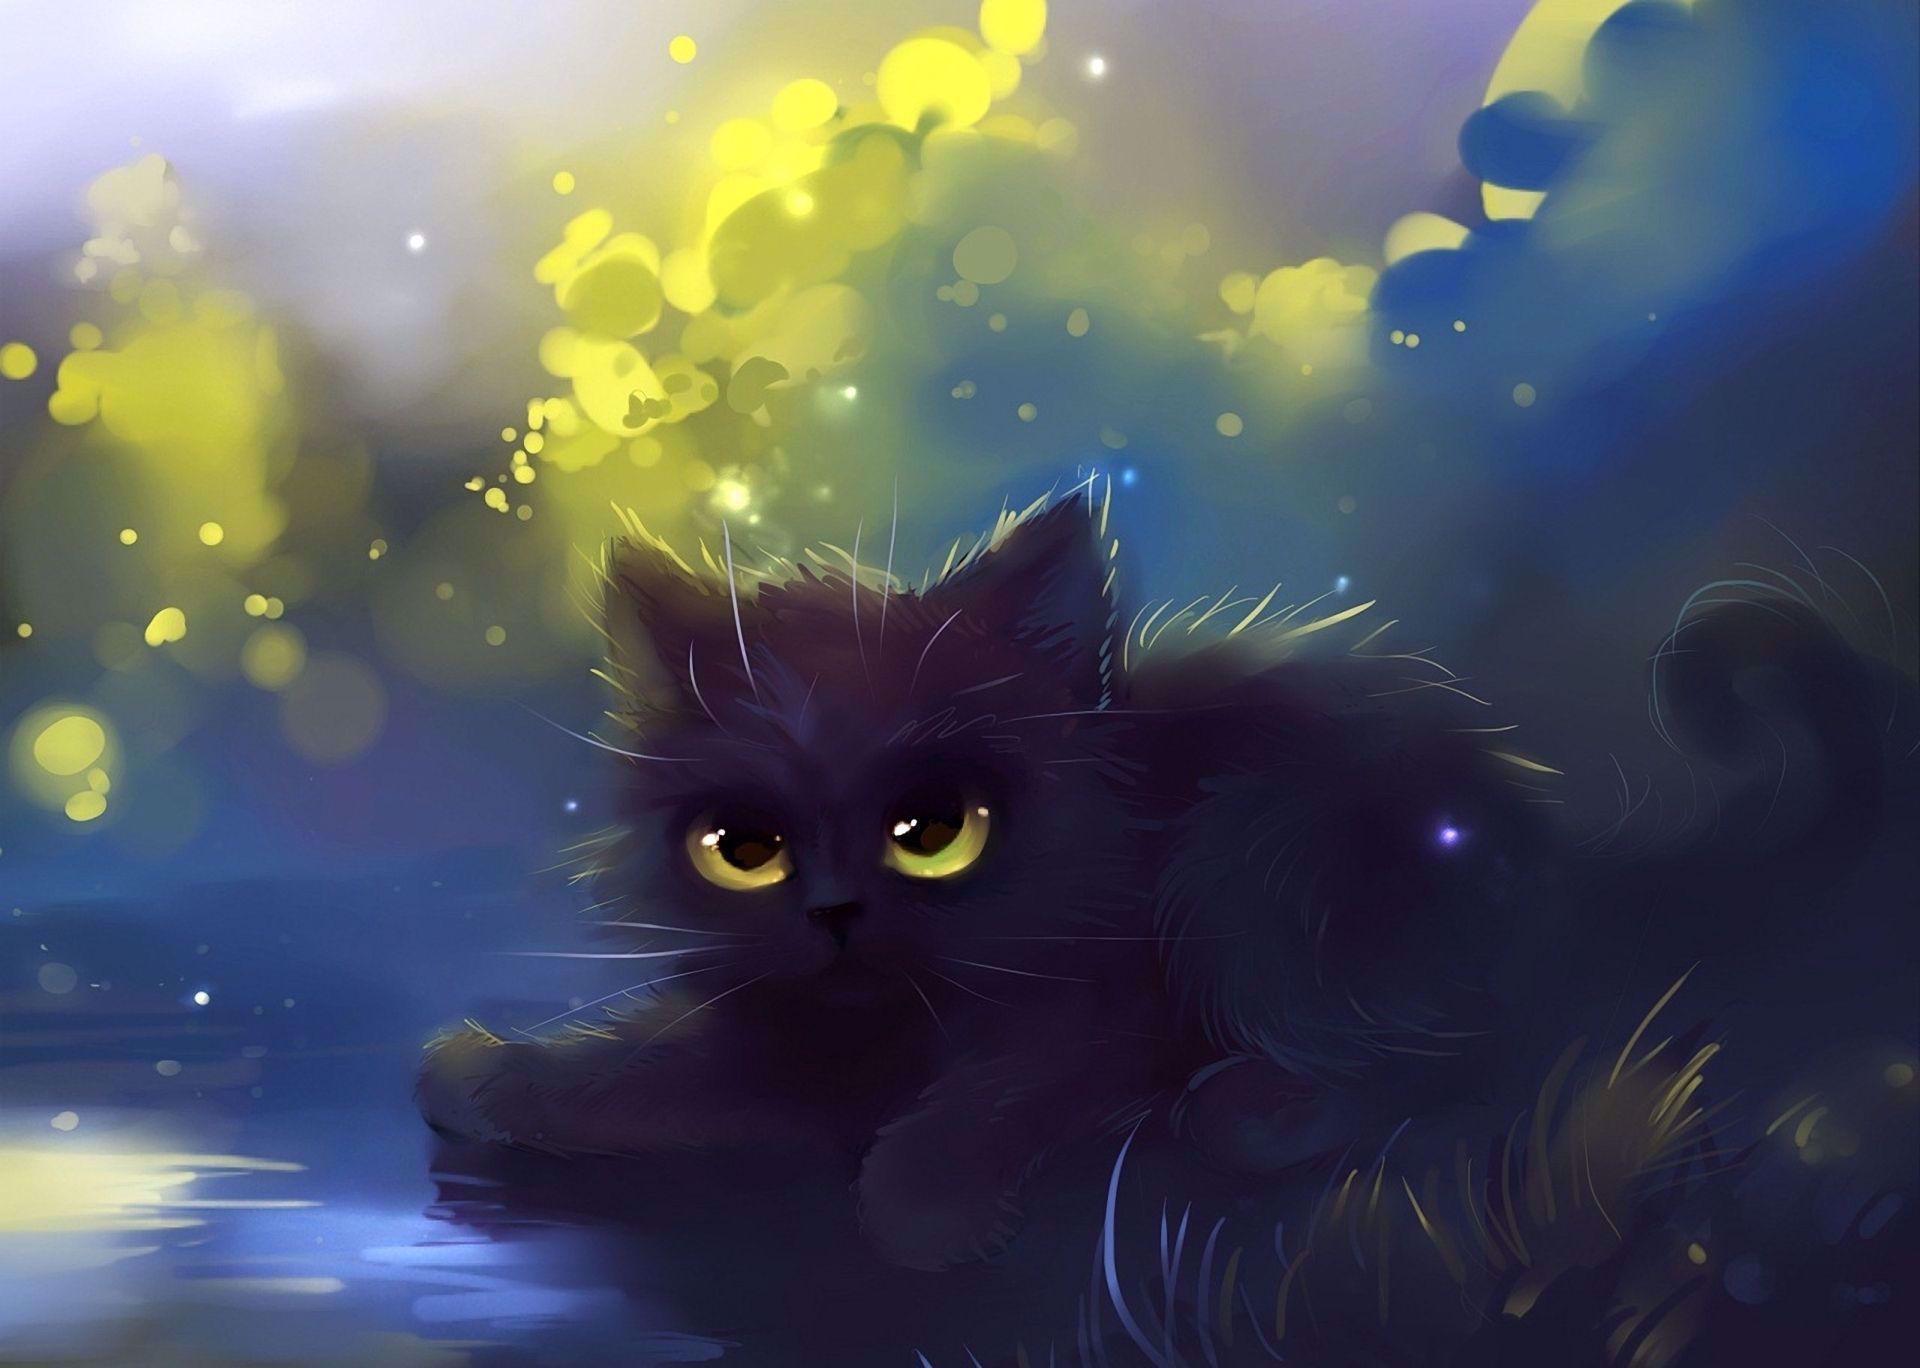 Cat Wallpaper Desktop In 2020 Cute Anime Cat